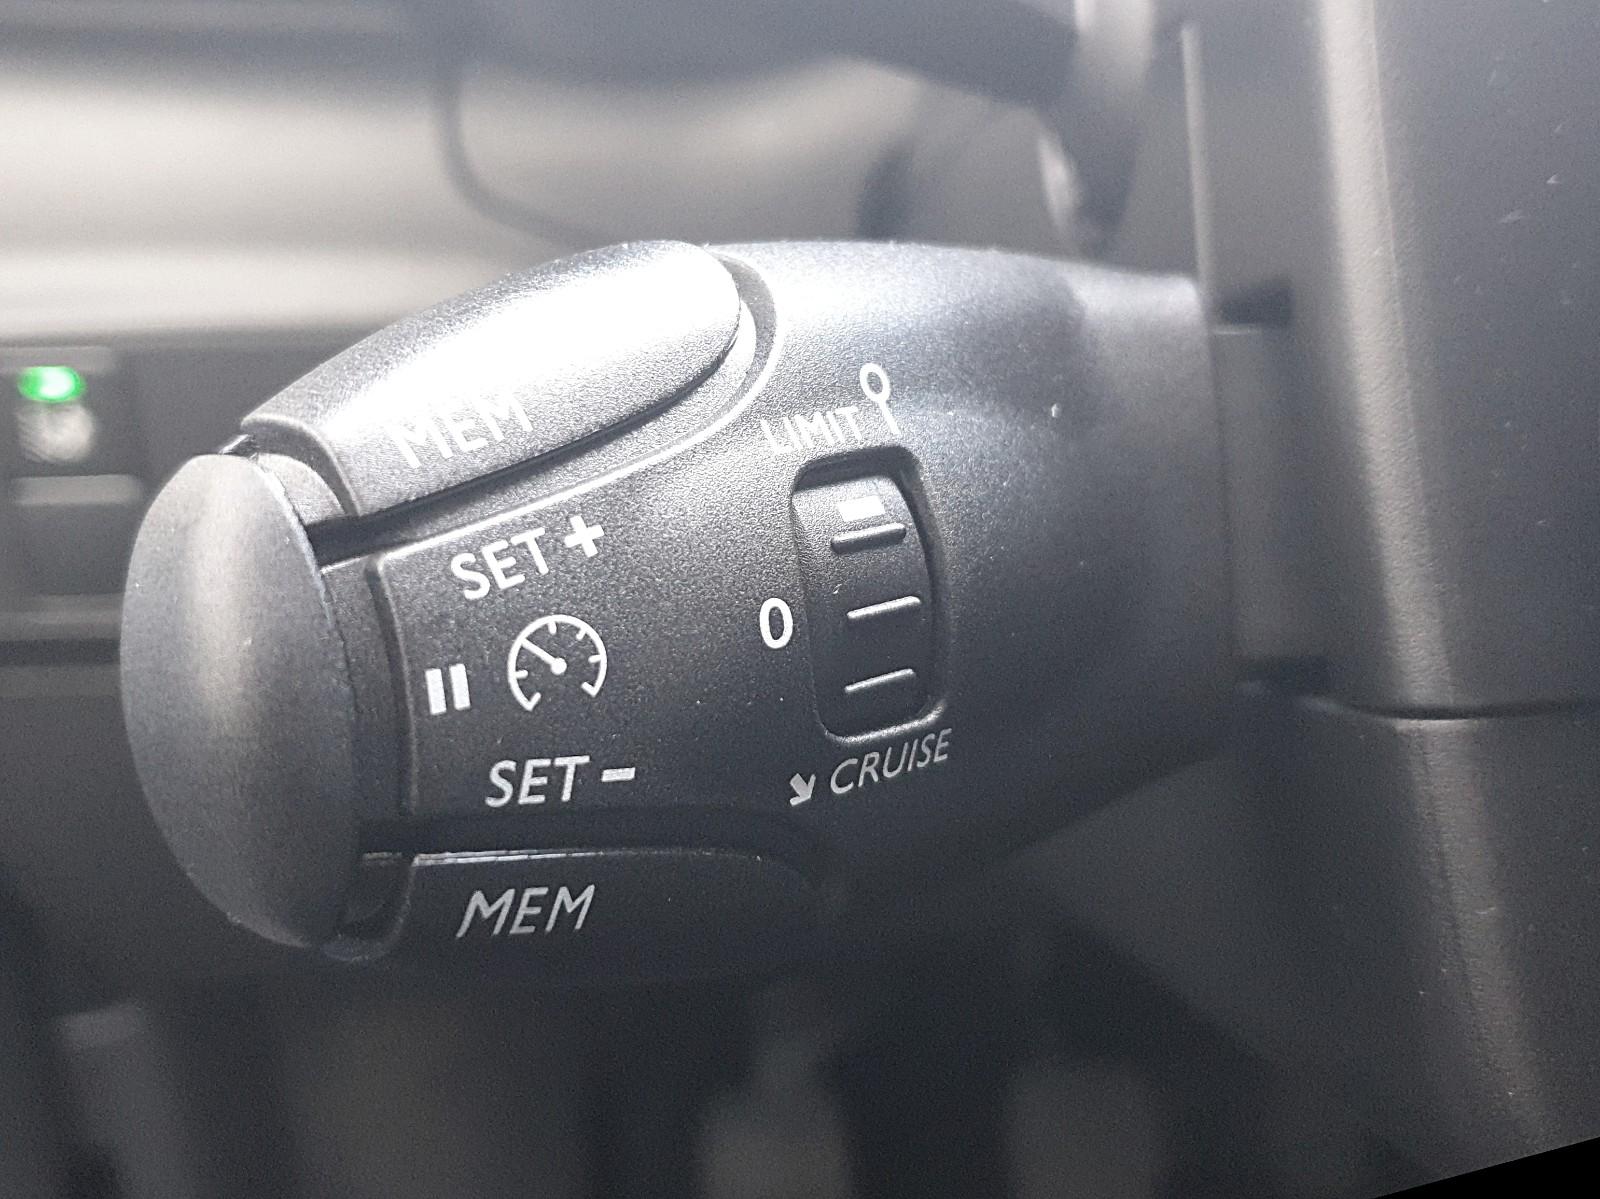 CITROEN C3 1.2 83PS Shine AirBump 5-Türig Klimaautomatik Navi PDC Temp. Neb Viscaal Fahrzeuggrosshandel GmbH, D-49847 Itterbeck